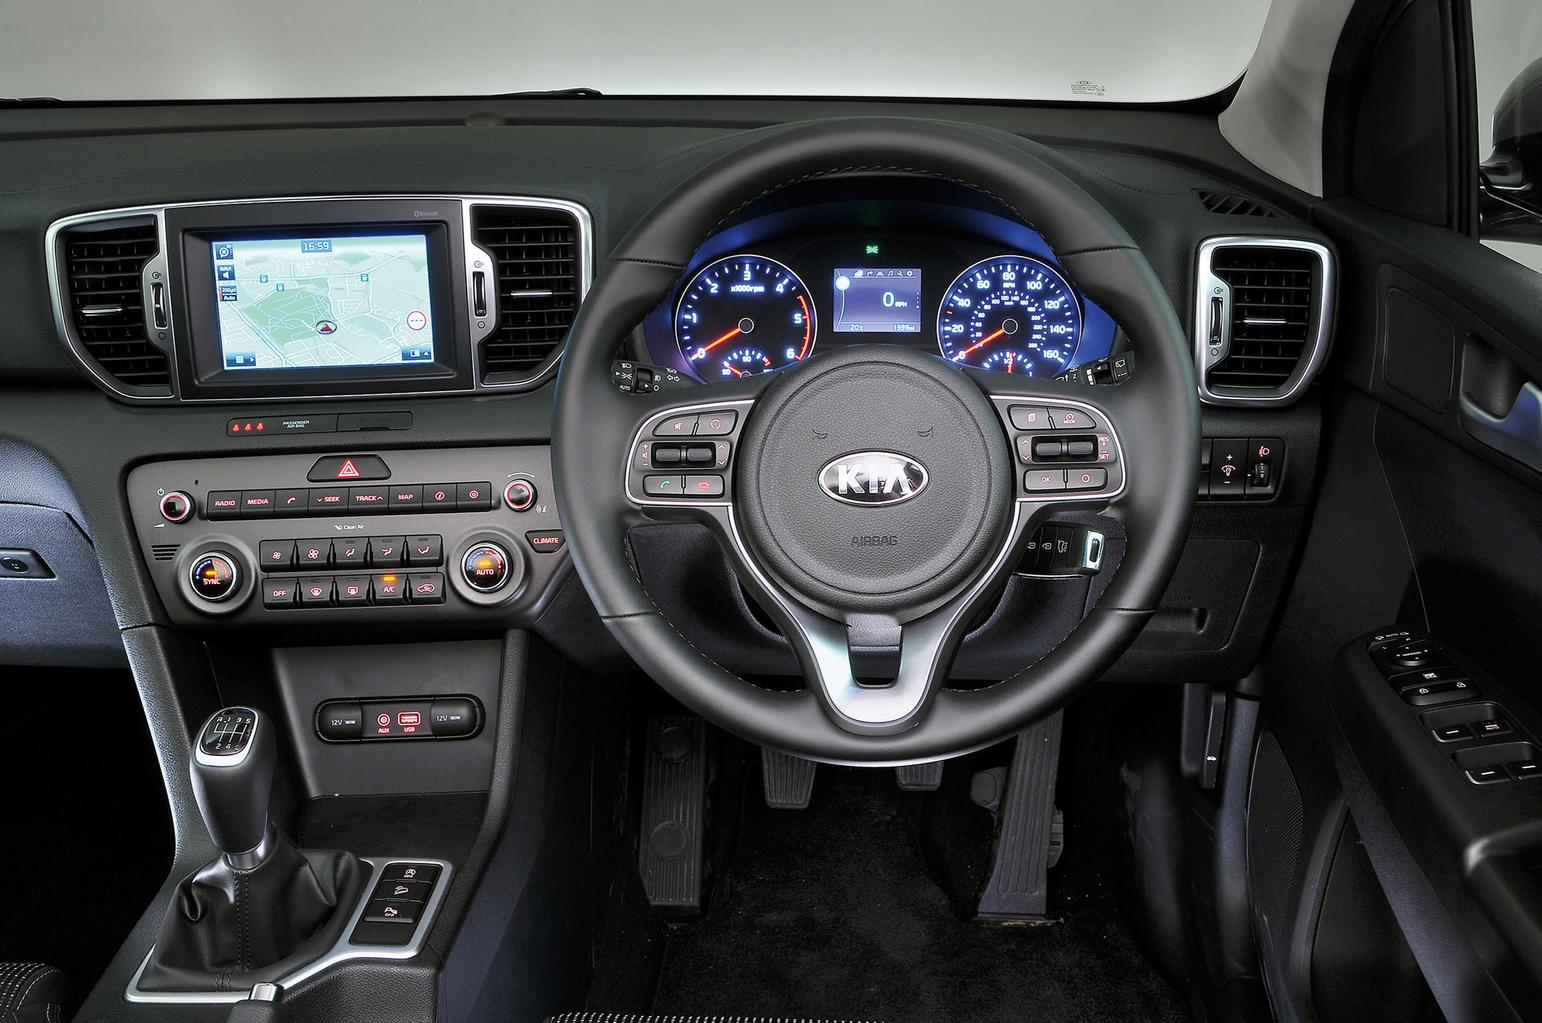 10 reasons to buy a Kia Sportage